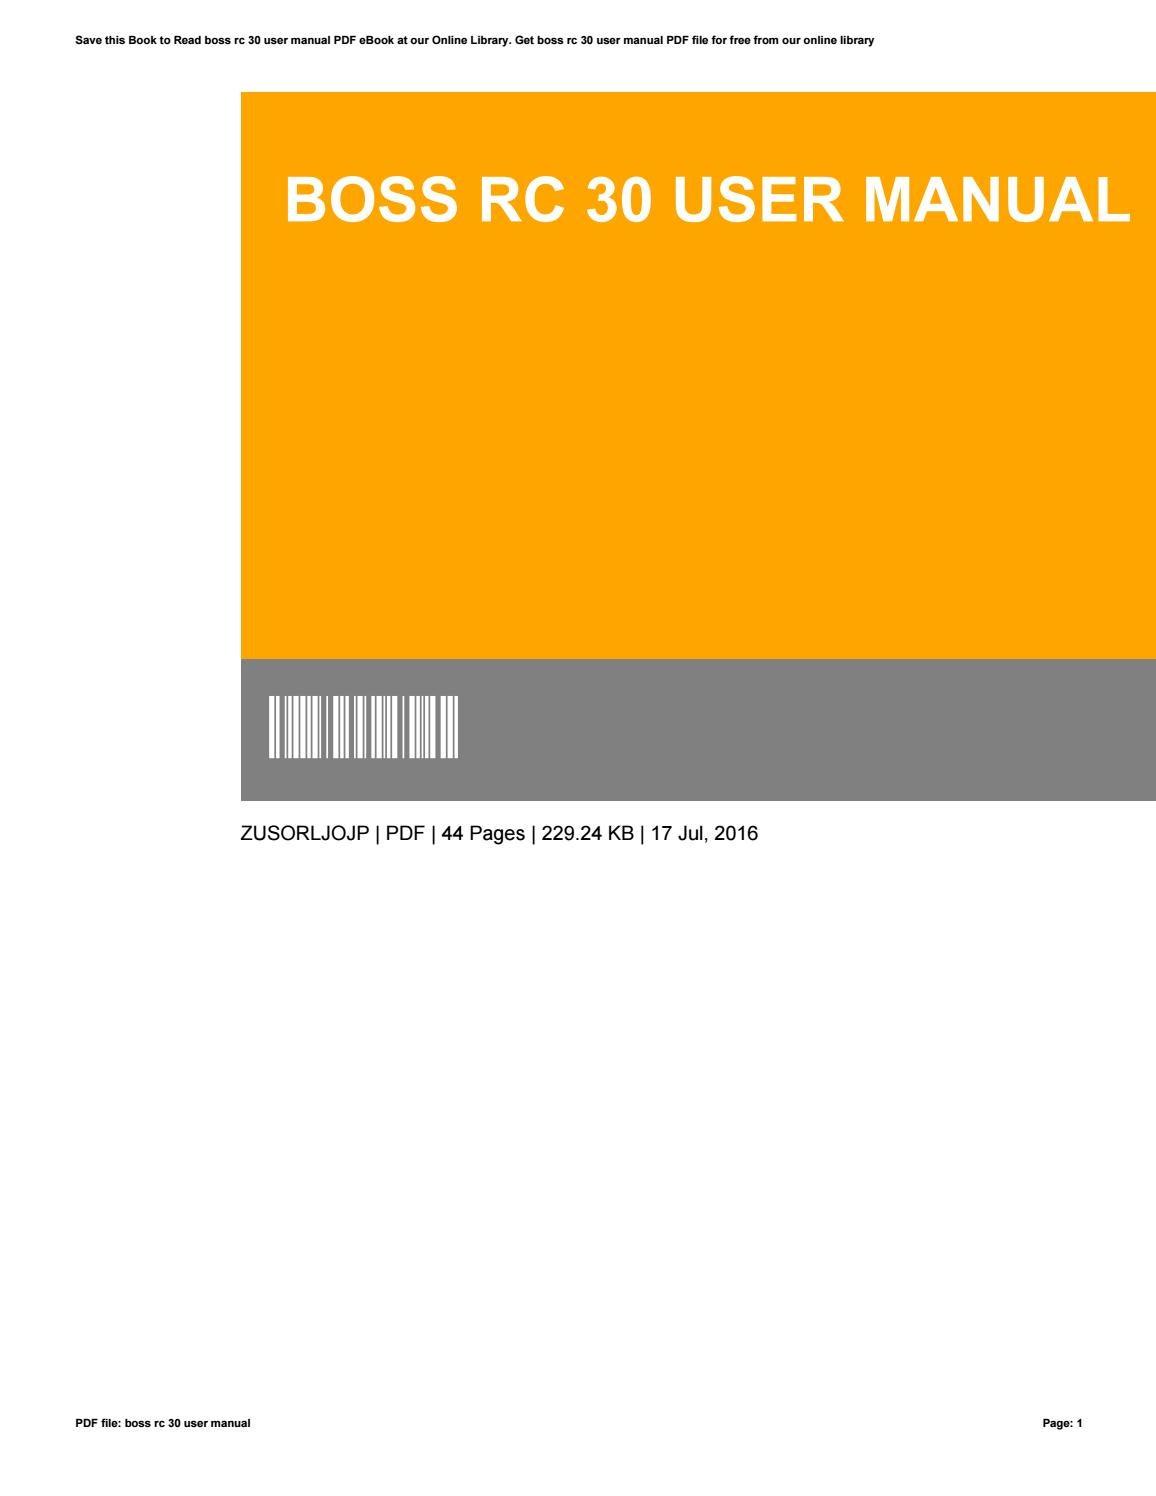 boss rc 3 user manual